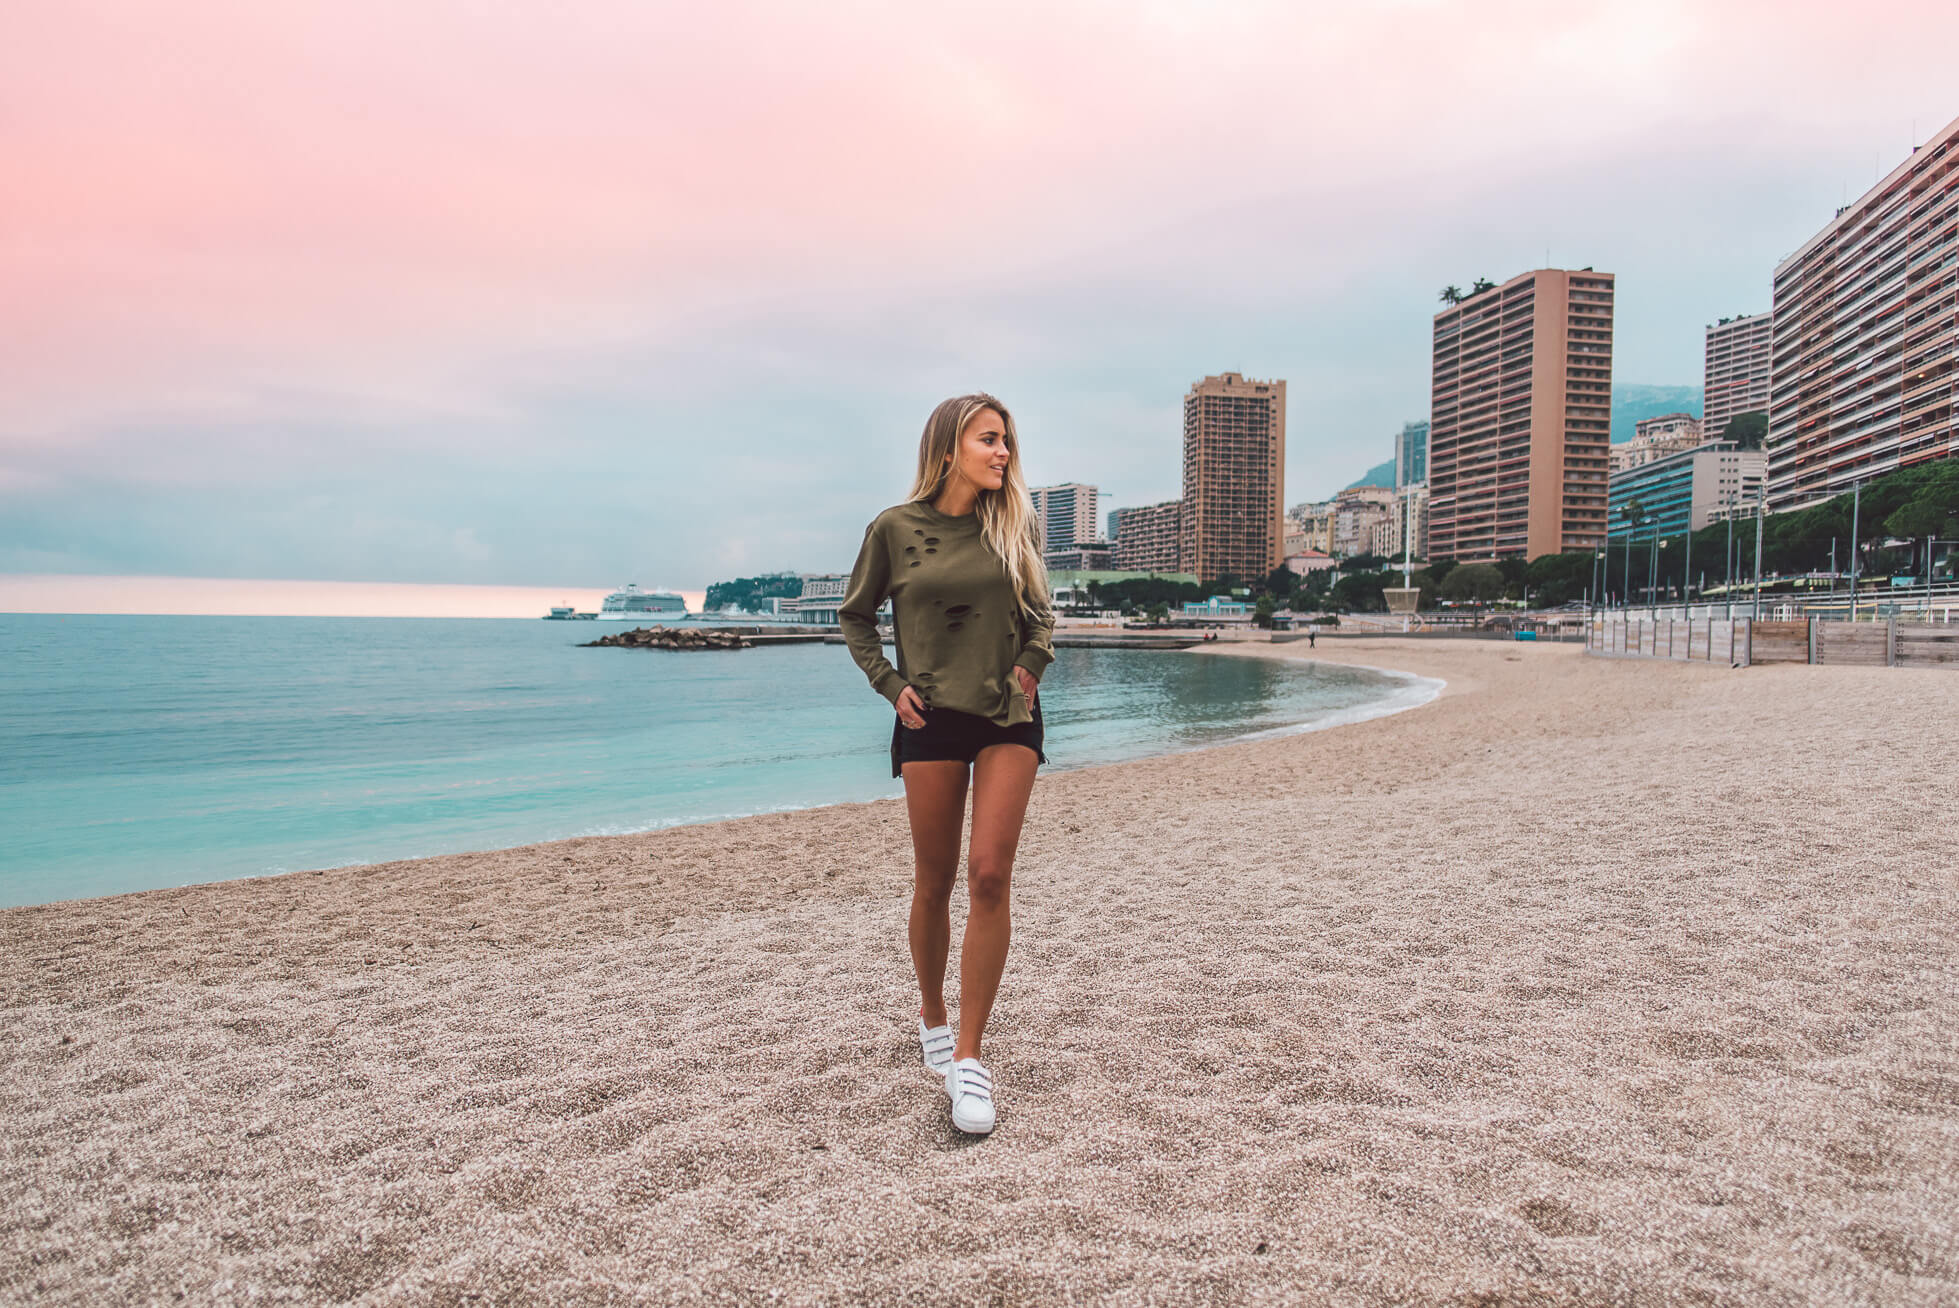 janni-deler-beachy-moment-sunsetDSC_7027